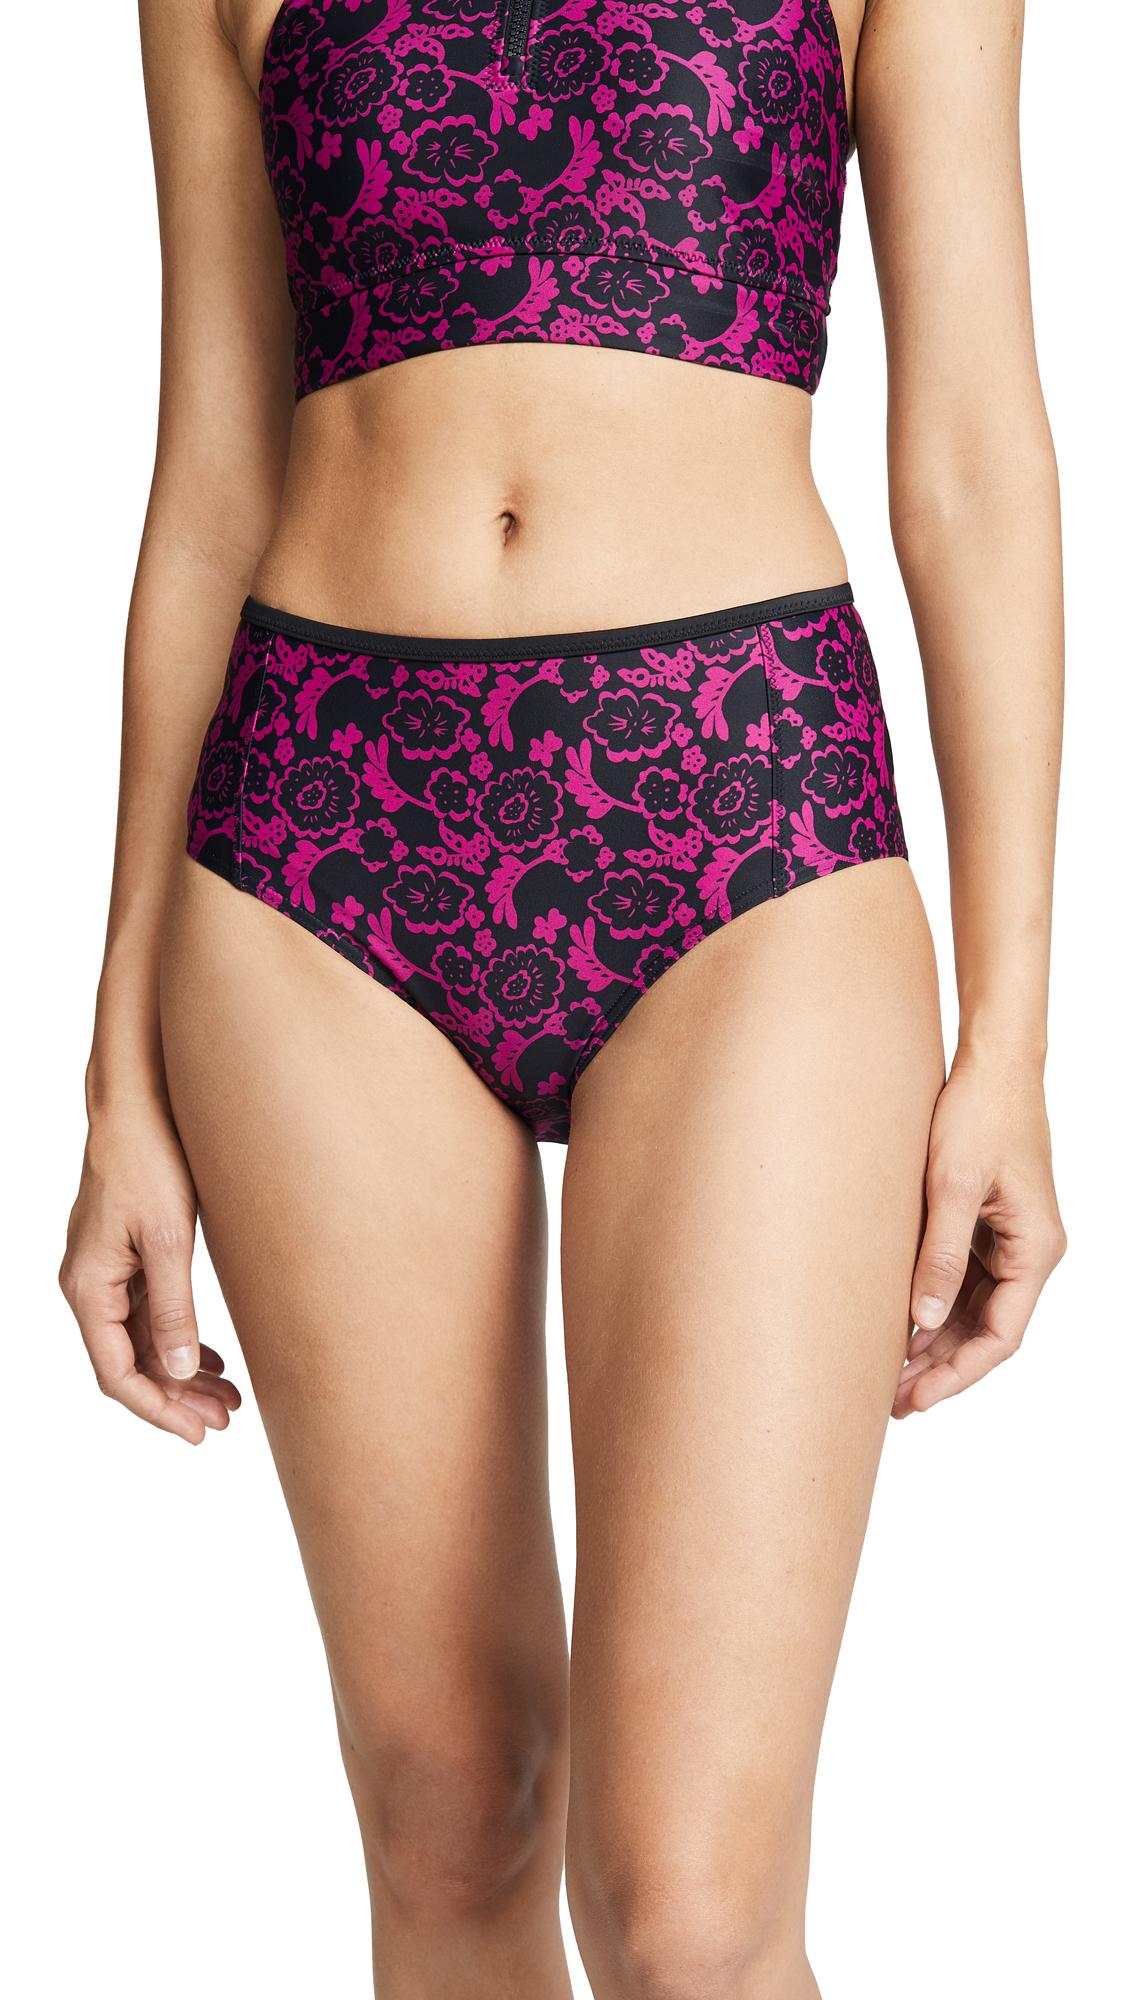 adidas by Stella McCartney Bikini Bottoms In Strong Pink/Black